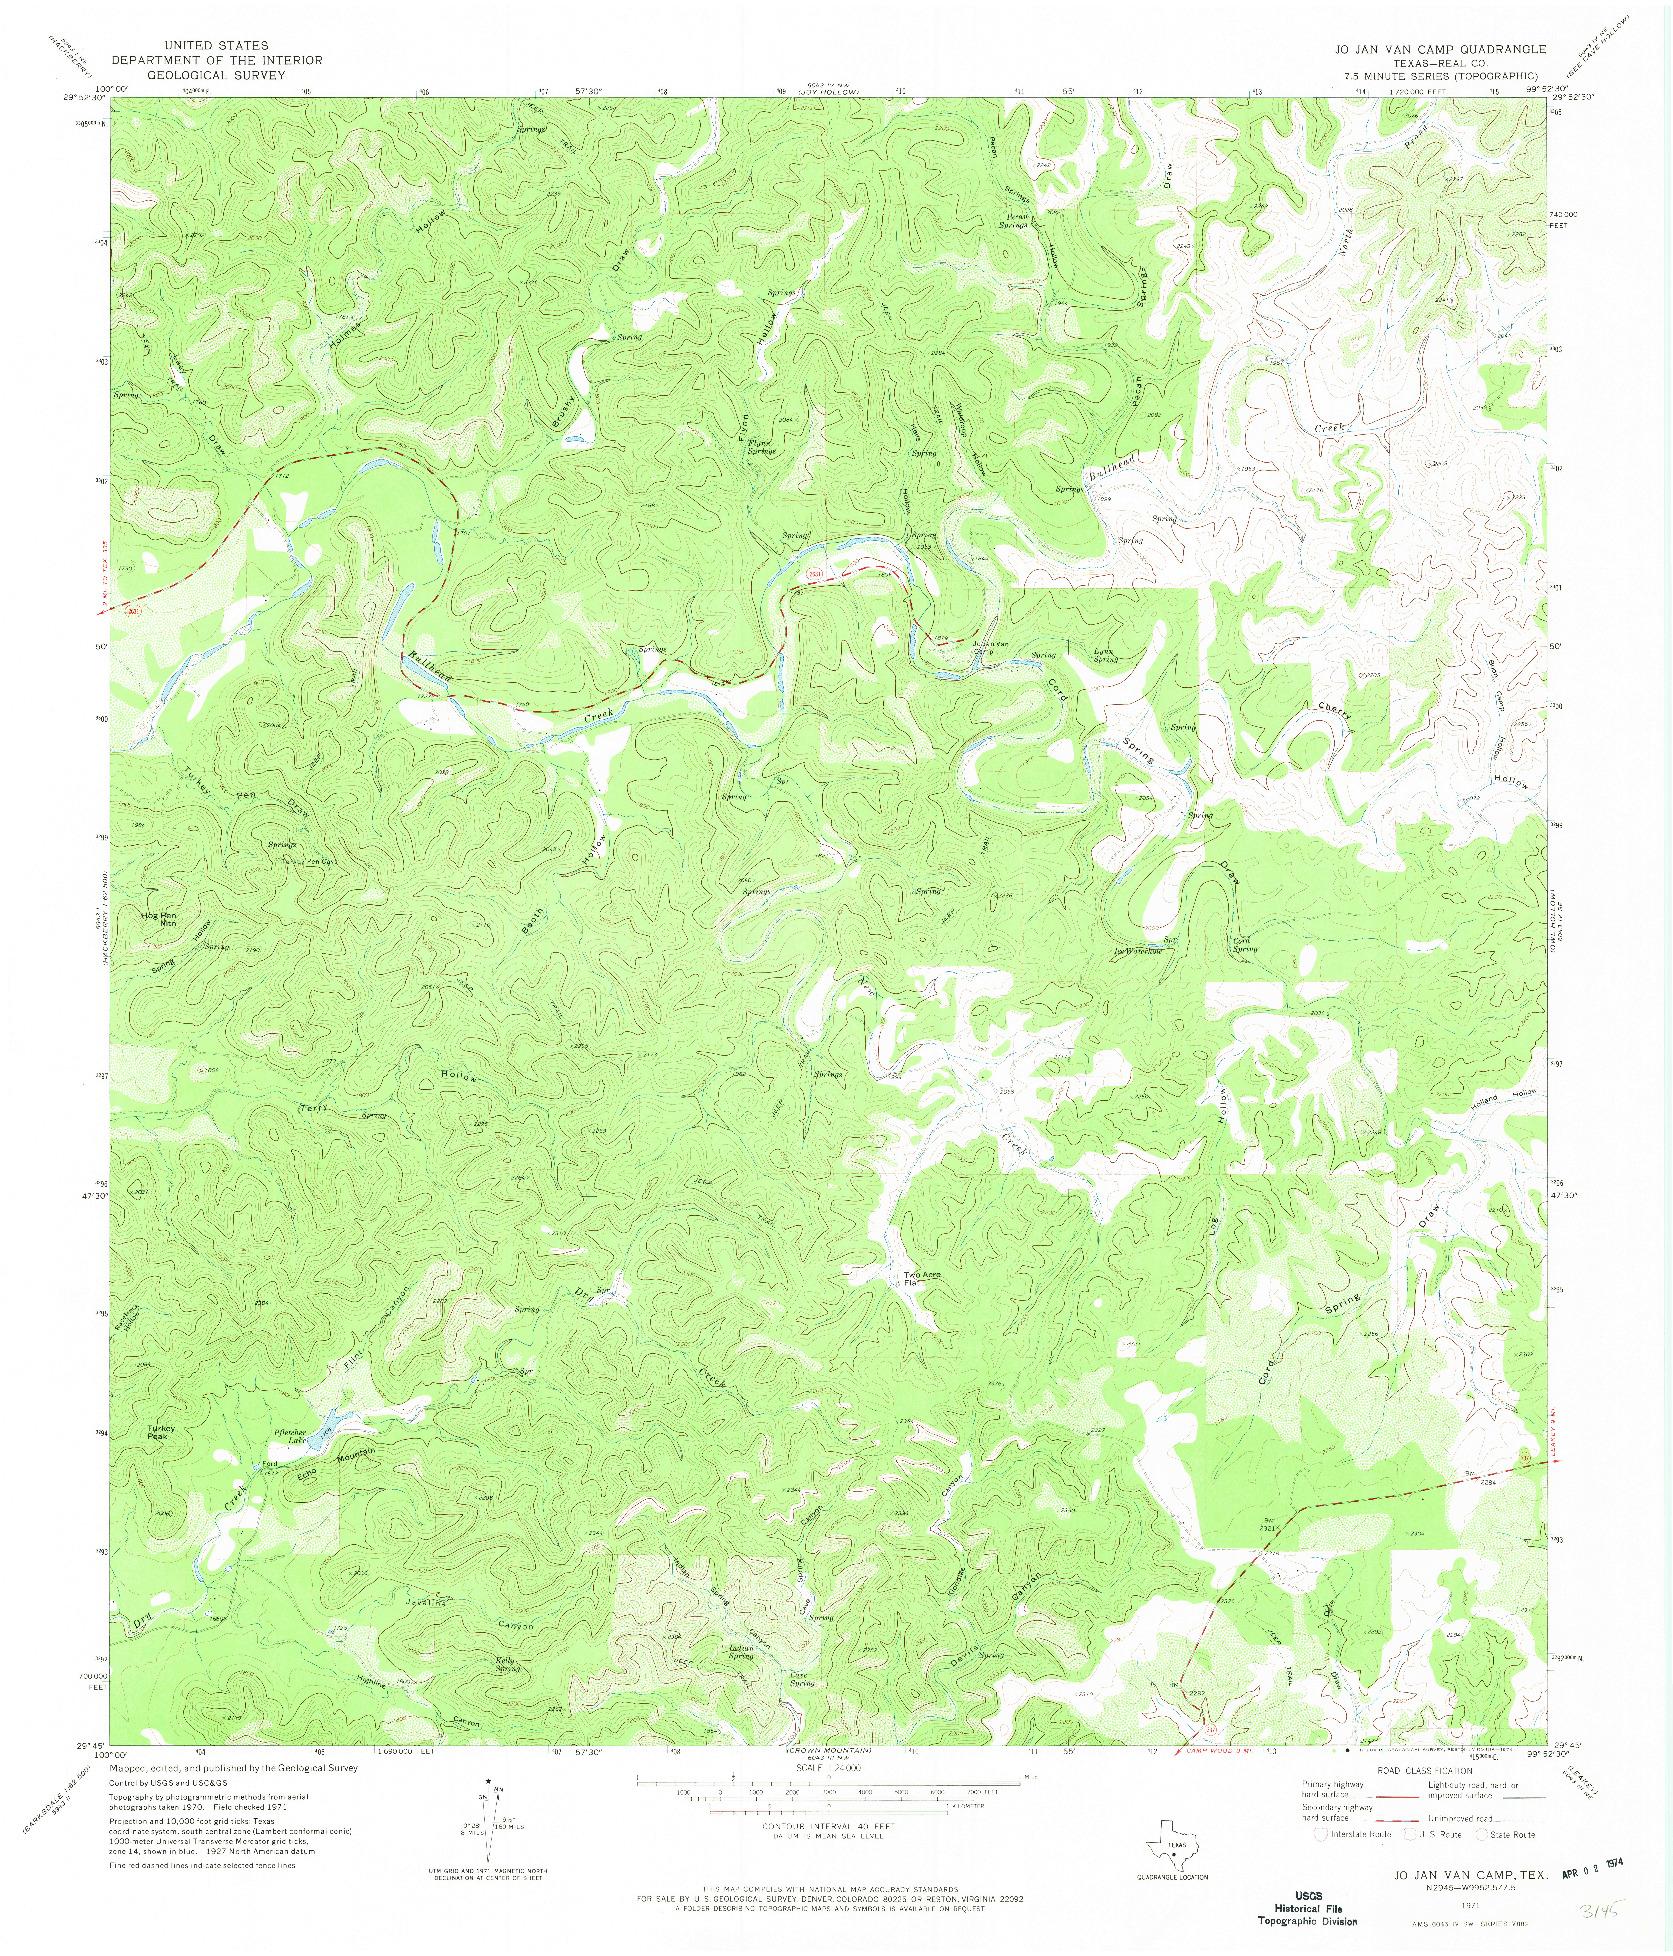 USGS 1:24000-SCALE QUADRANGLE FOR JO JAN VAN CAMP, TX 1971